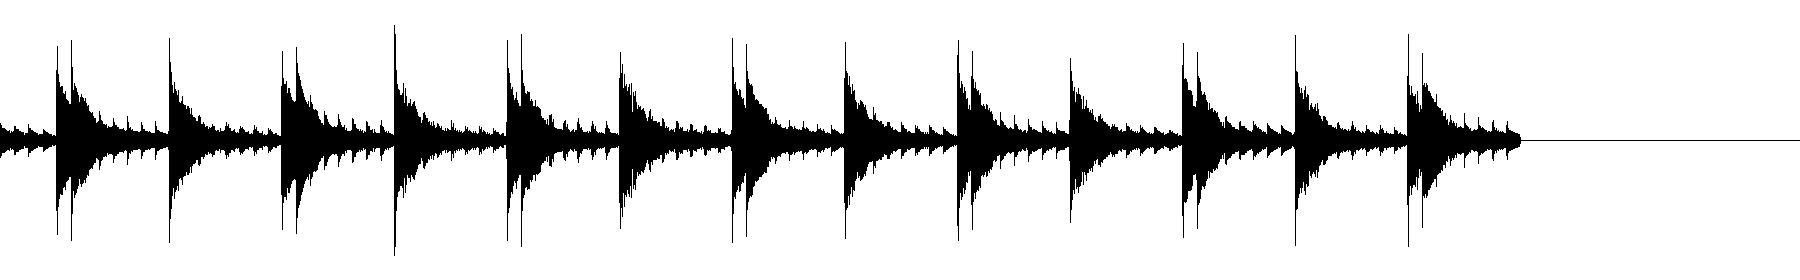 dts chordlp 41a cm wet